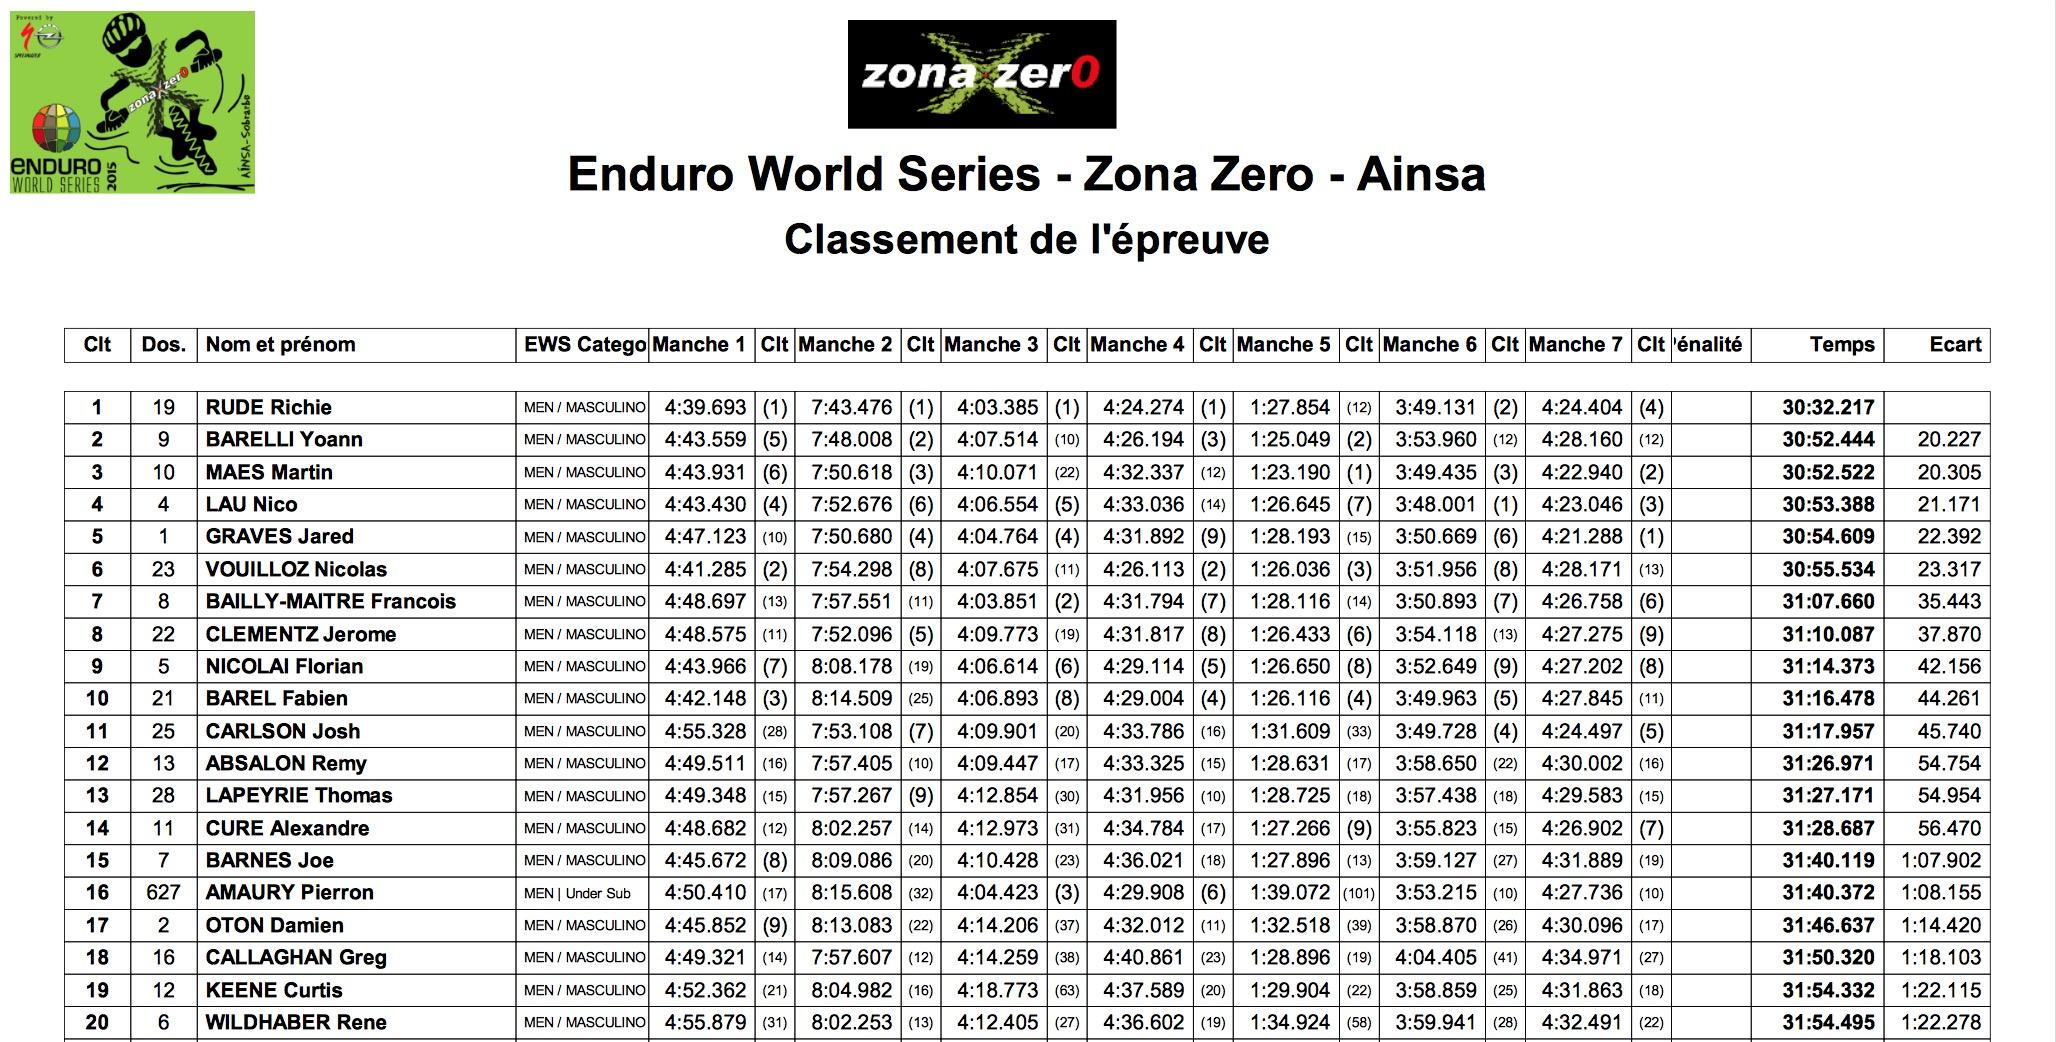 ews2015_zonazero_classement j2